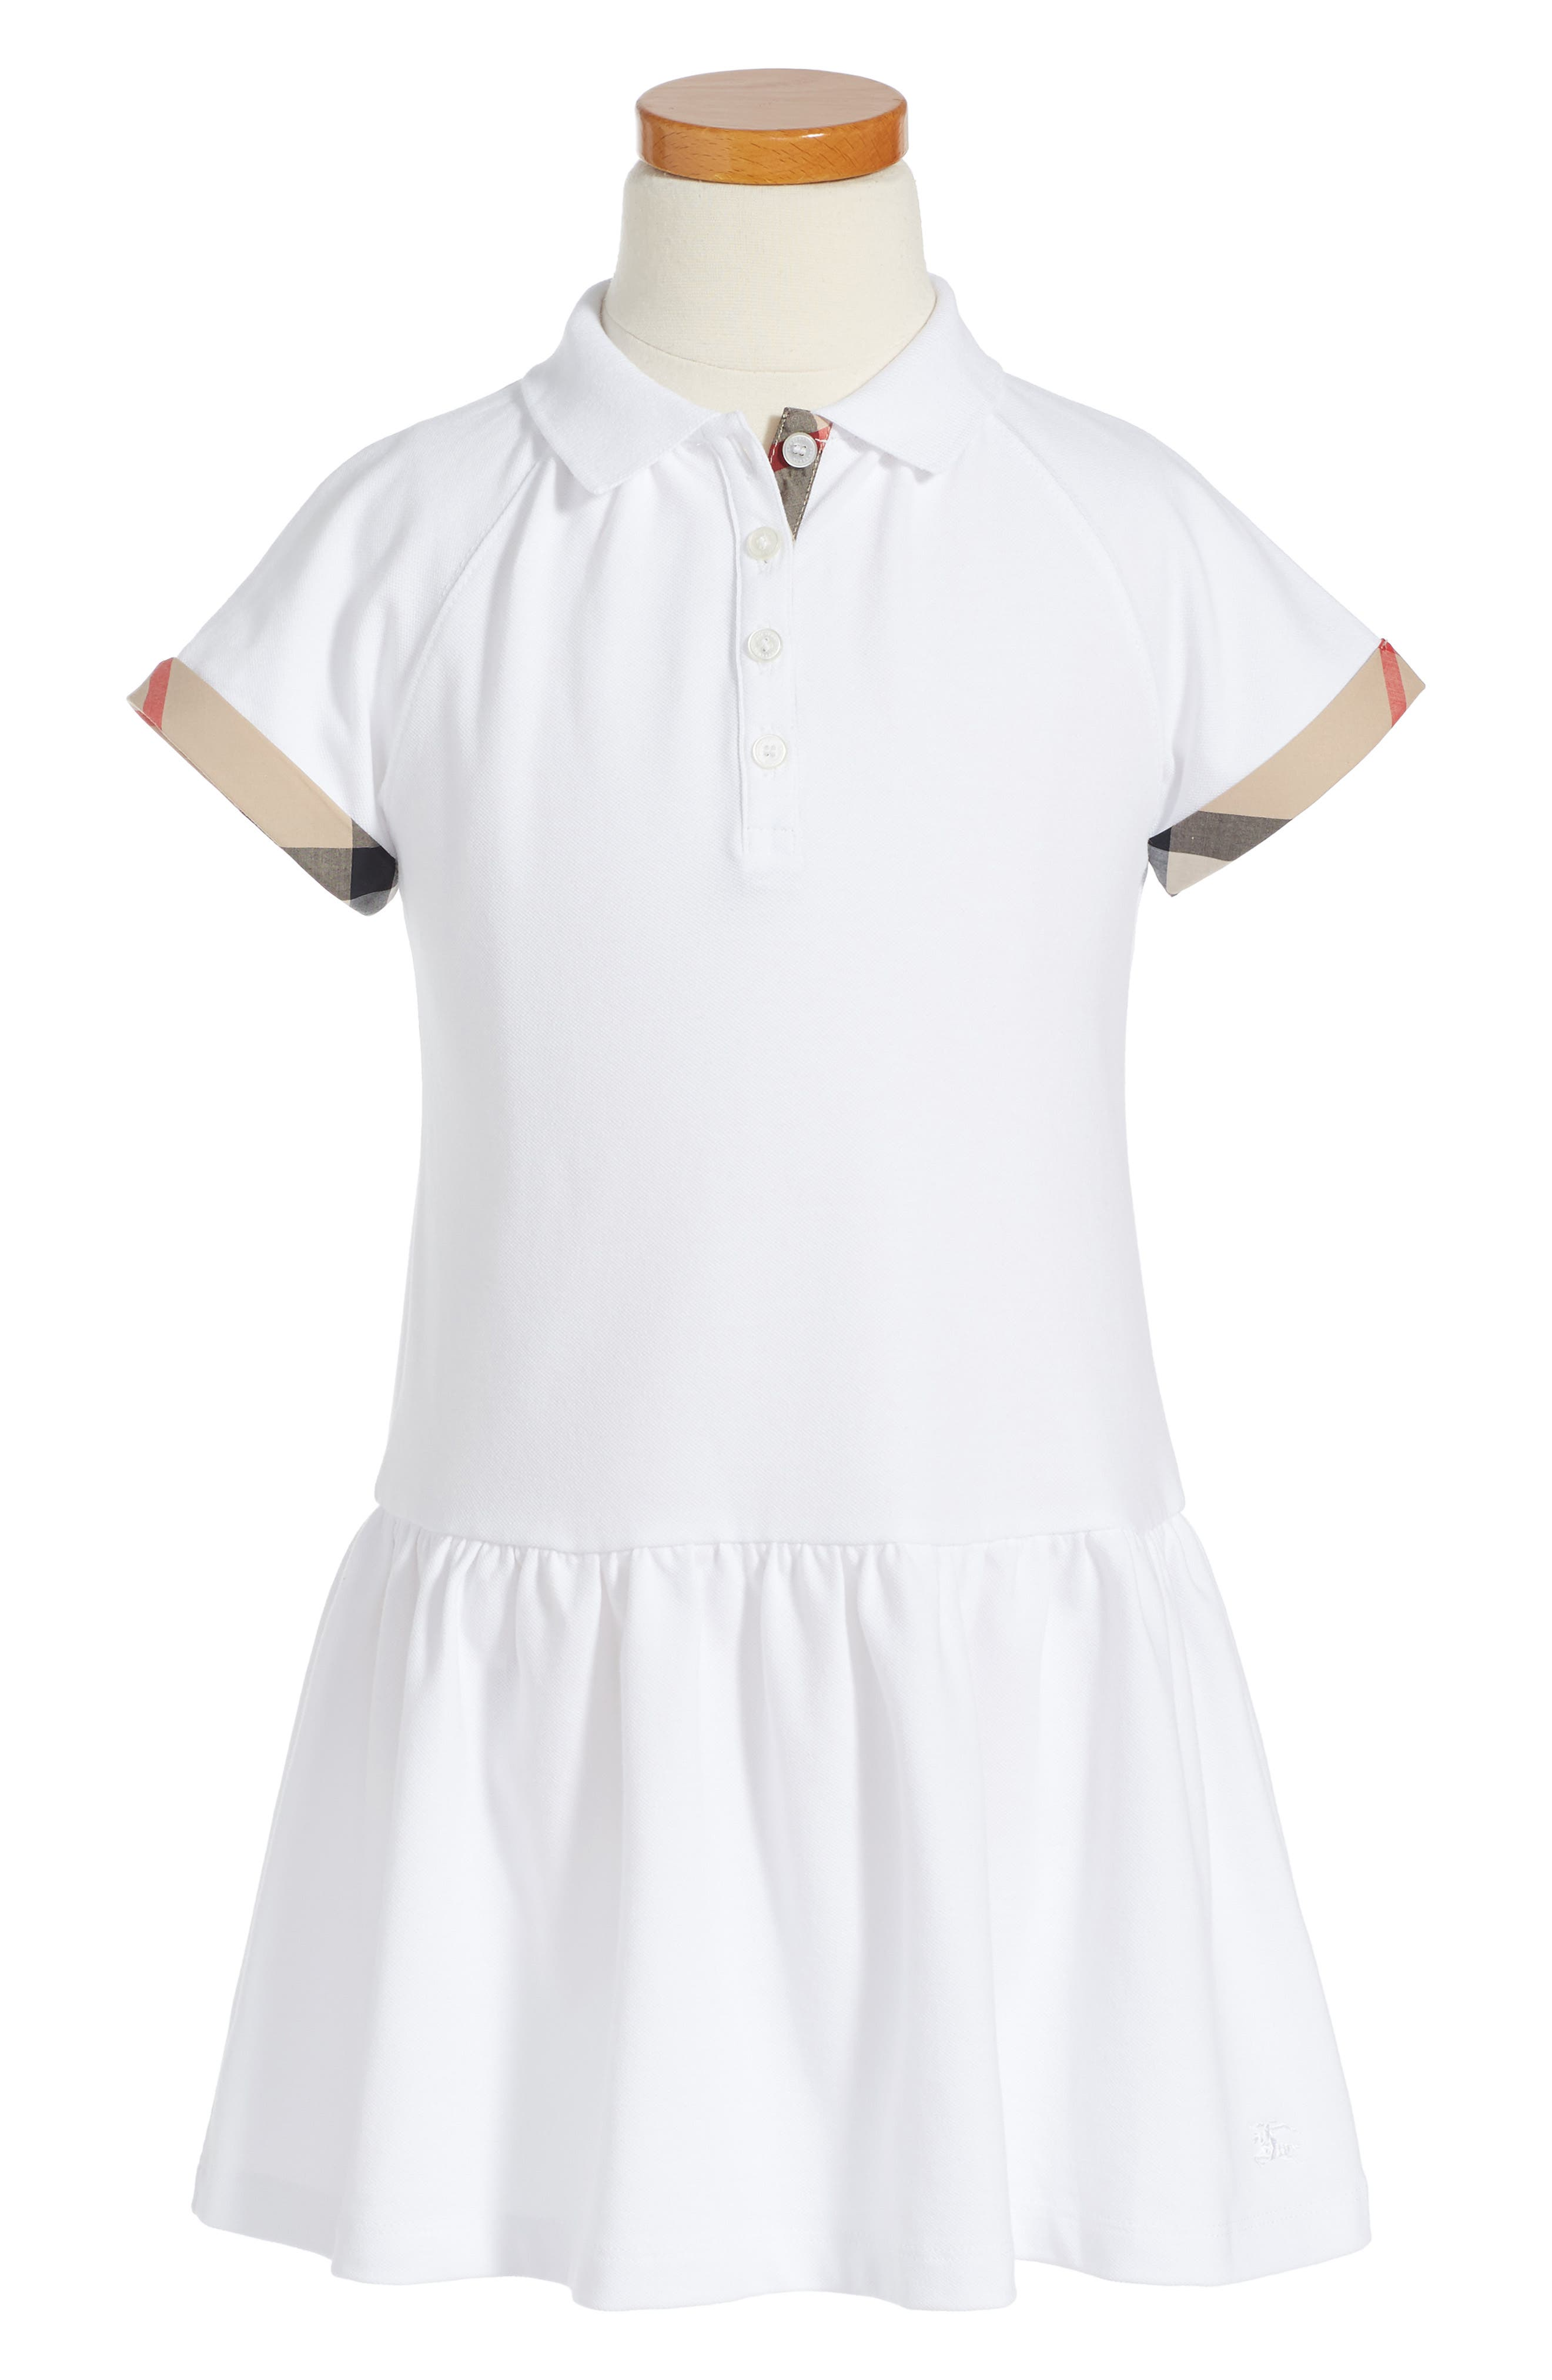 Alternate Image 1 Selected - Burberry Cali Dress (Little Girls & Big Girls)